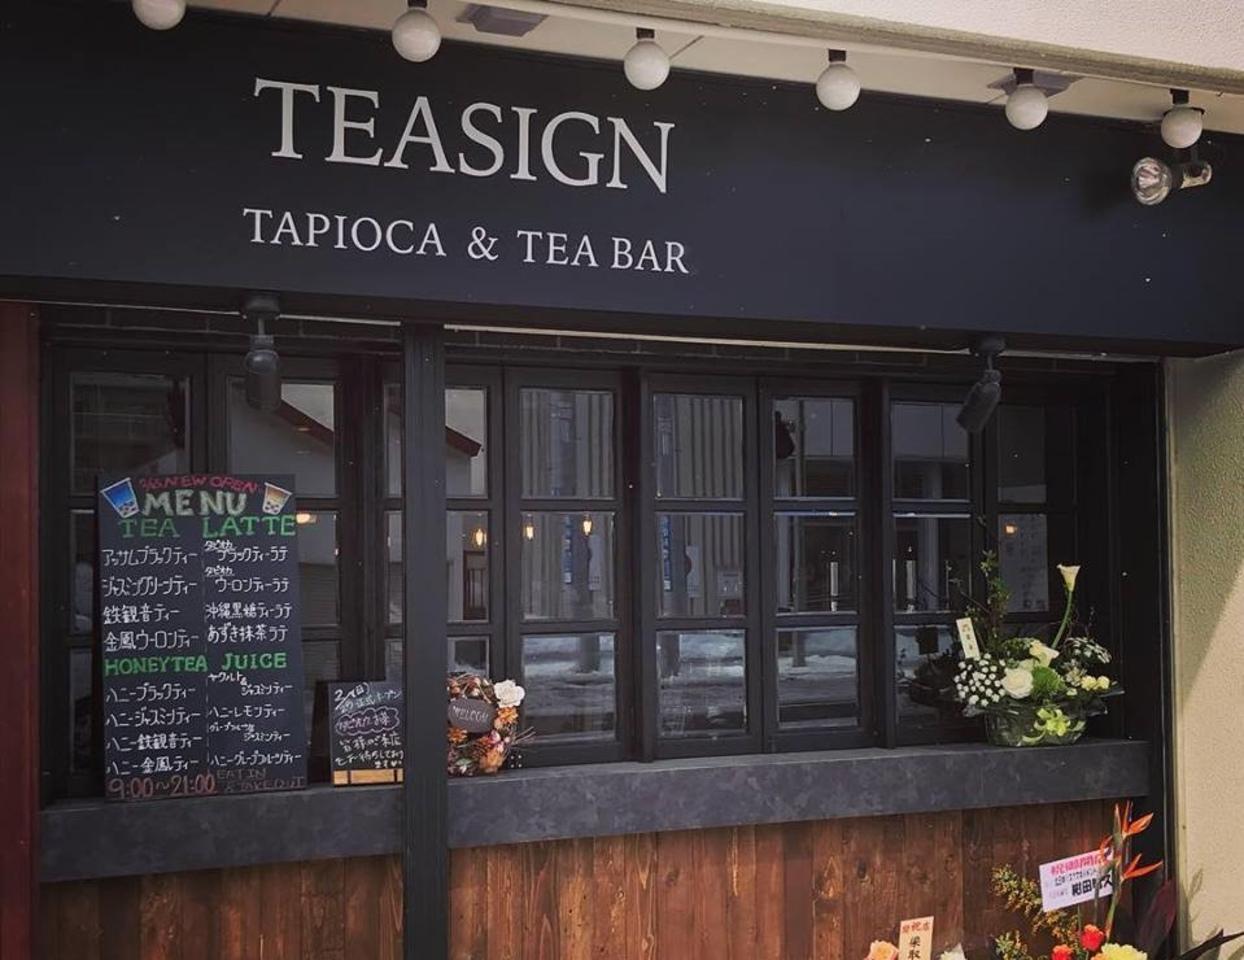 台湾茶専門店「TEASIGN TAPIOCA & TEA BAR」2月25日GRAND OPEN!